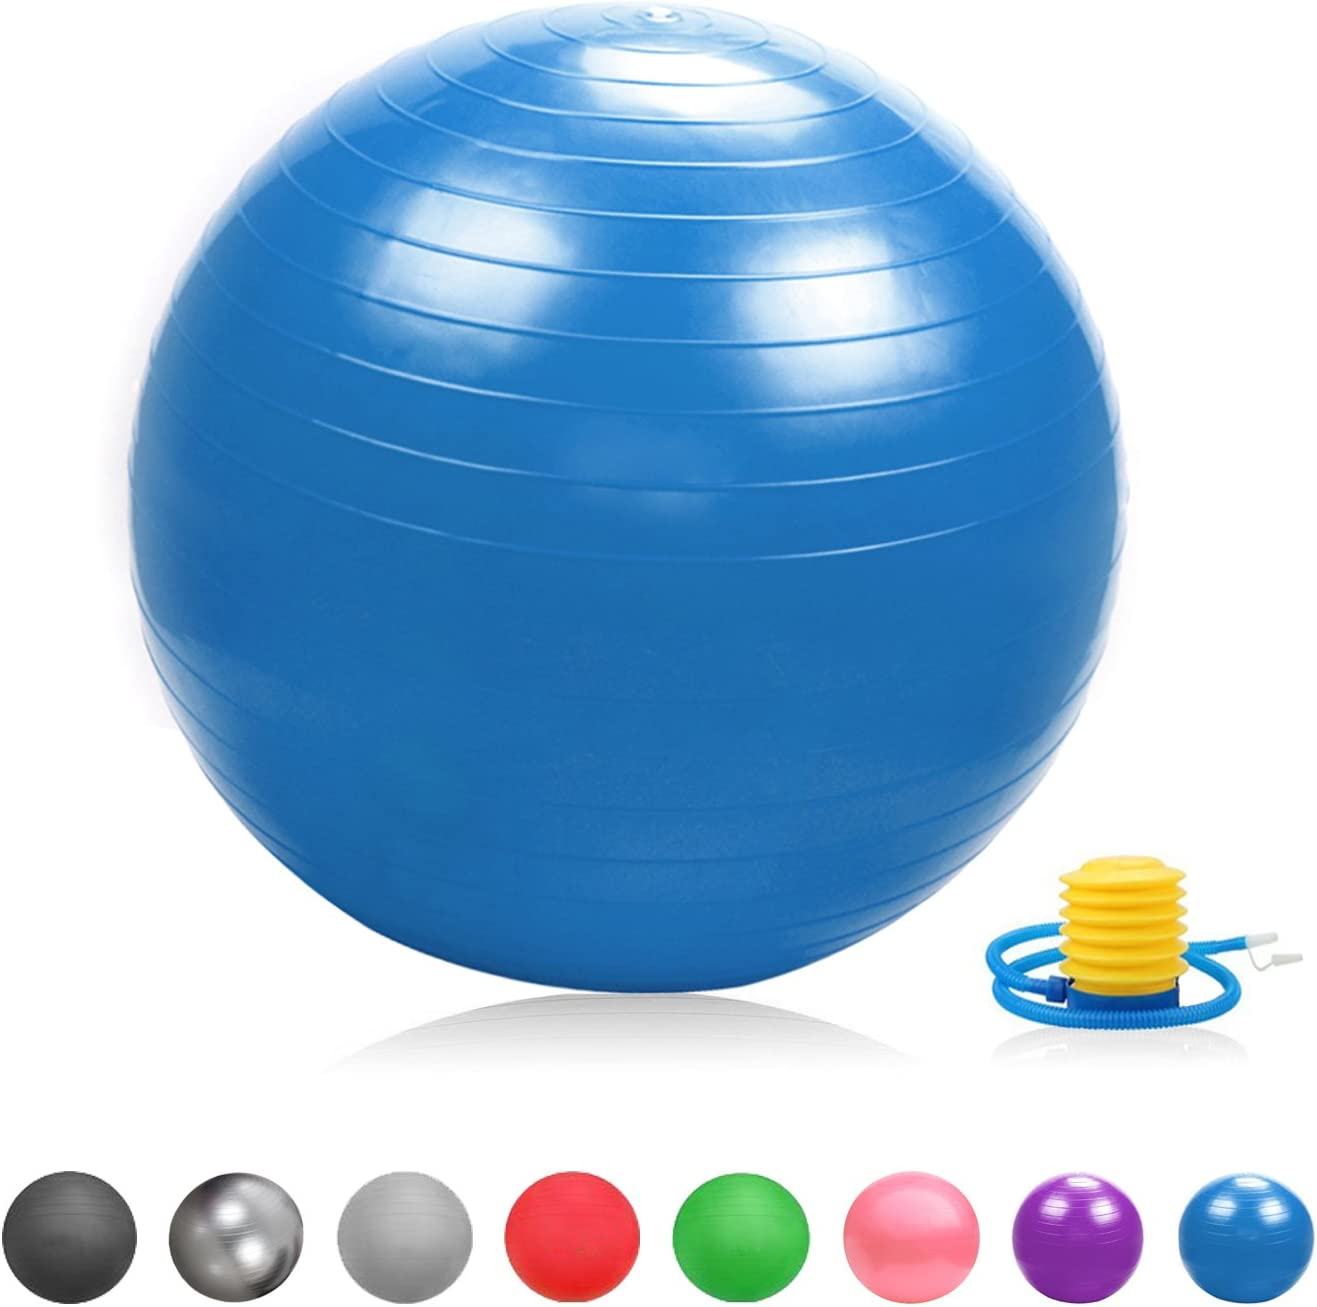 Mini Pilates Yoga Ball Obstrucci/ón Solapas Pelota Carcasa Glamexx24 Suave Pezi Swiss Pelota de Dick Anti Burst Asiento Pelota de Gimnasia Fitness Bal/ón de Bomba